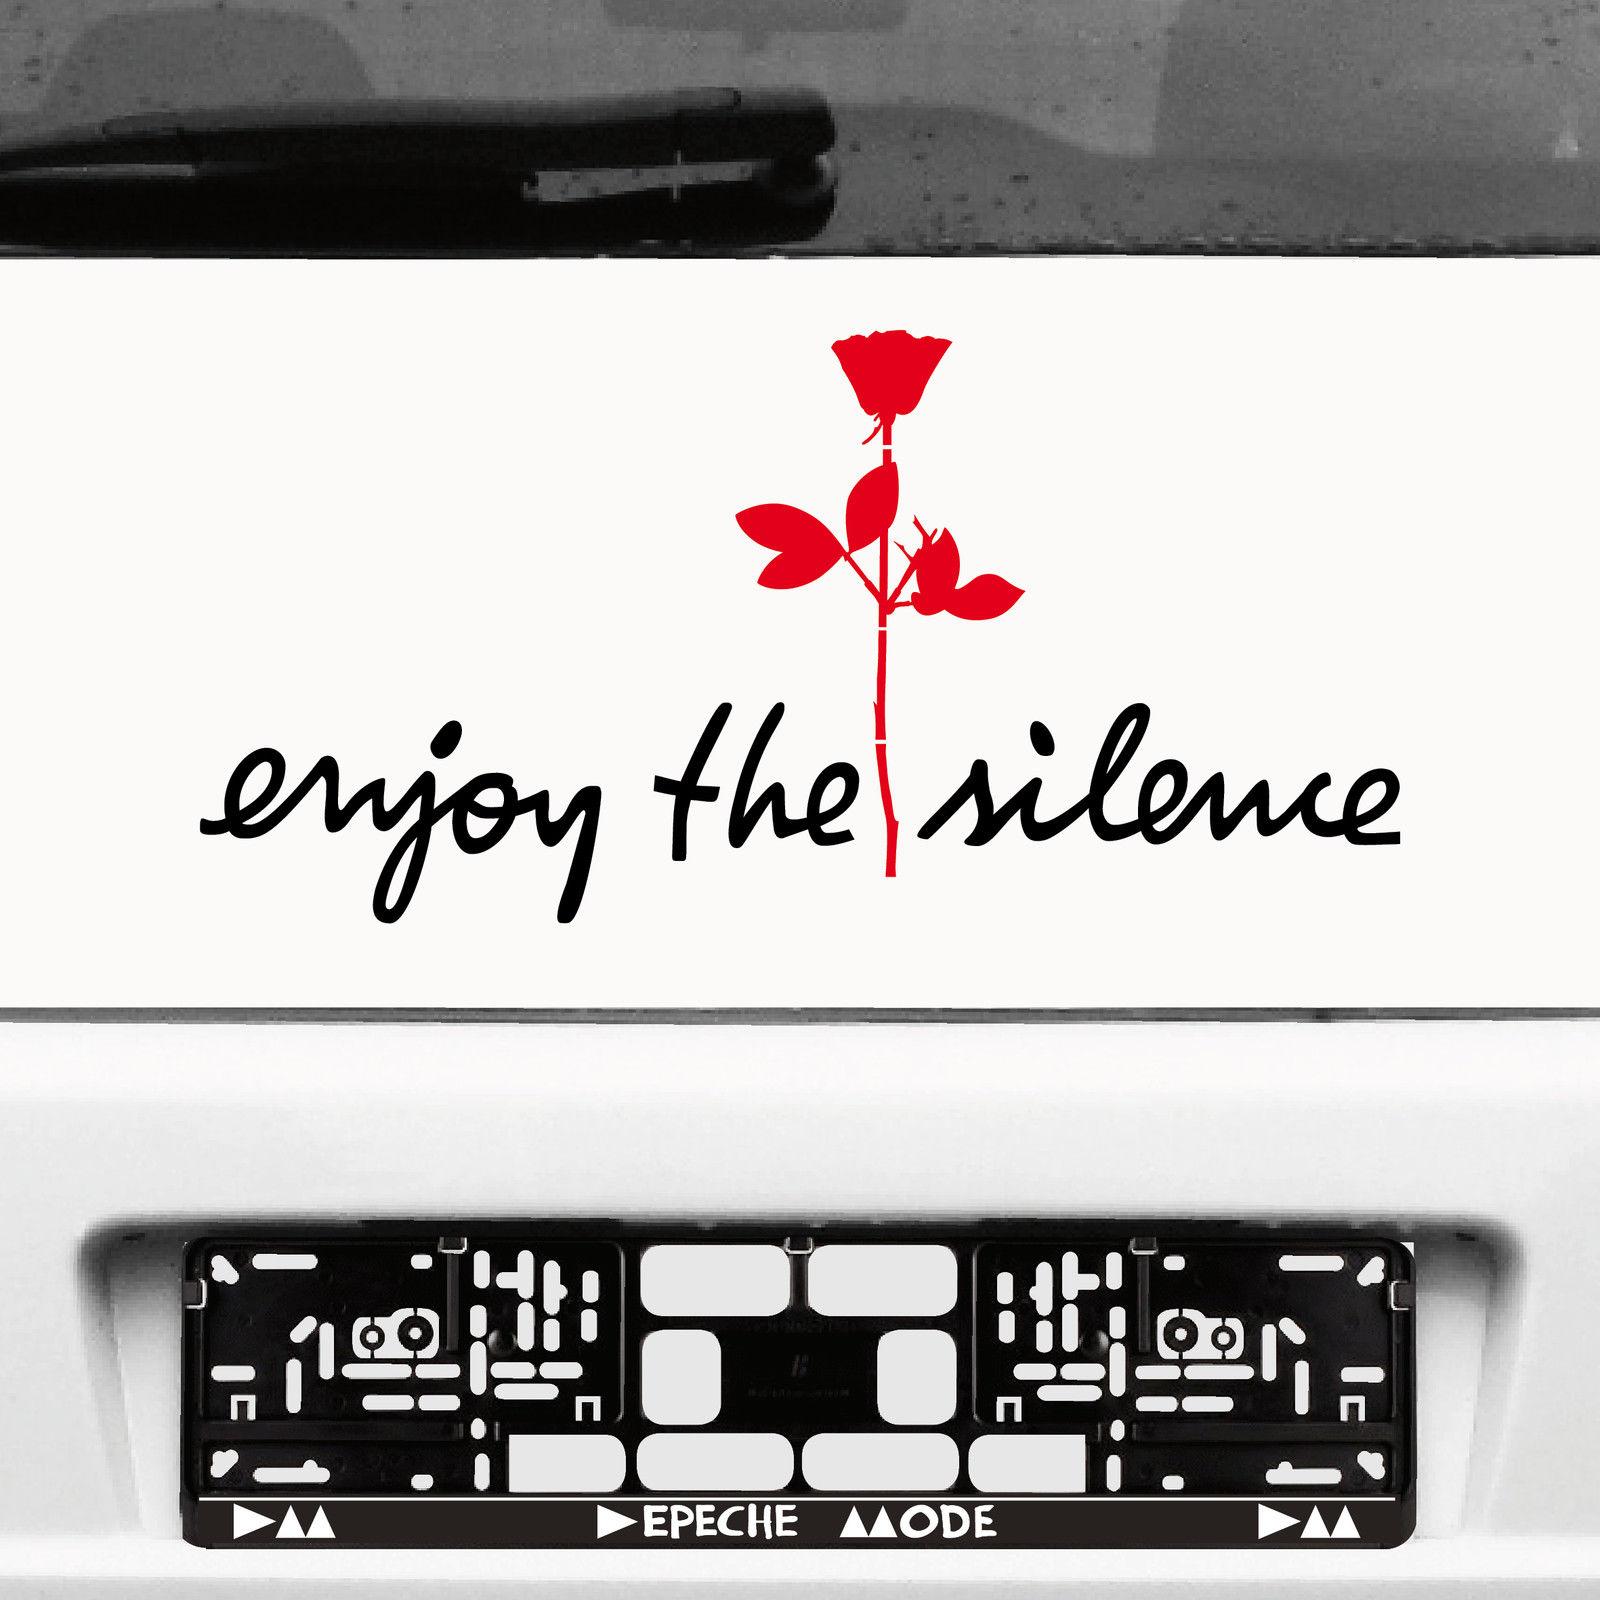 enjoy the silence rose aufkleber auto die cut tattoo deko folie depeche mode kaufen bei green it. Black Bedroom Furniture Sets. Home Design Ideas